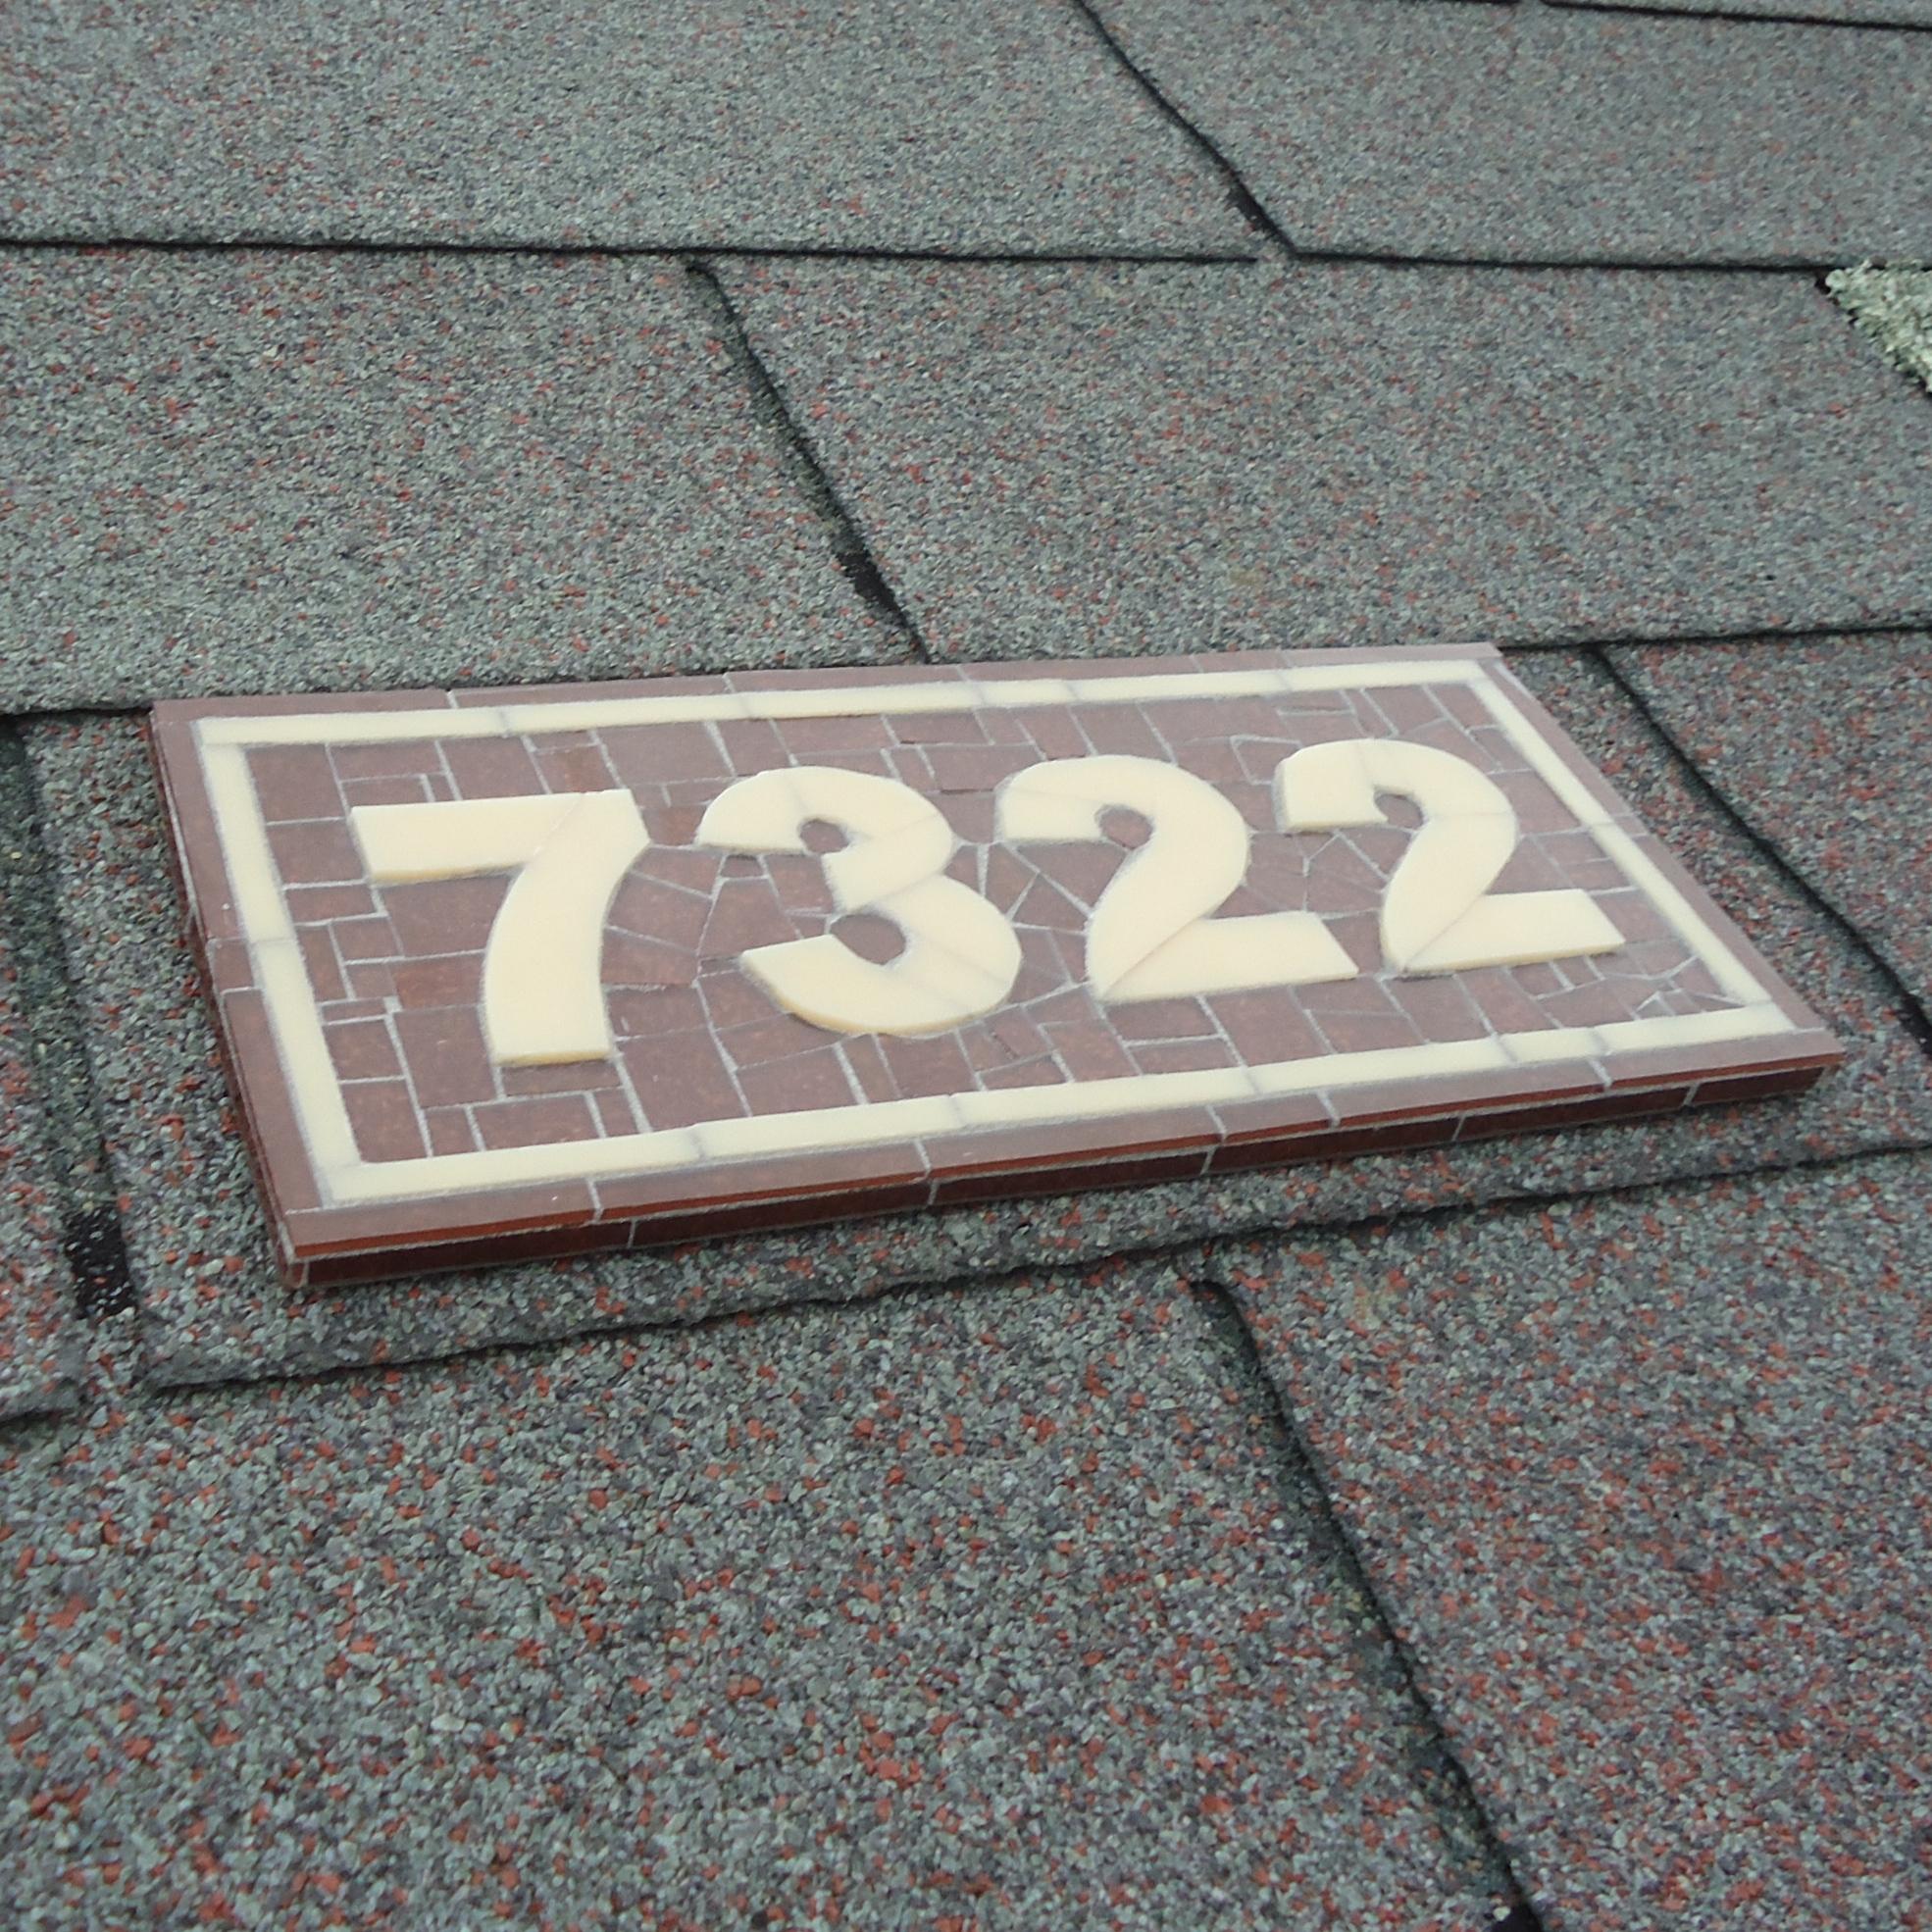 7322 House Number.JPG